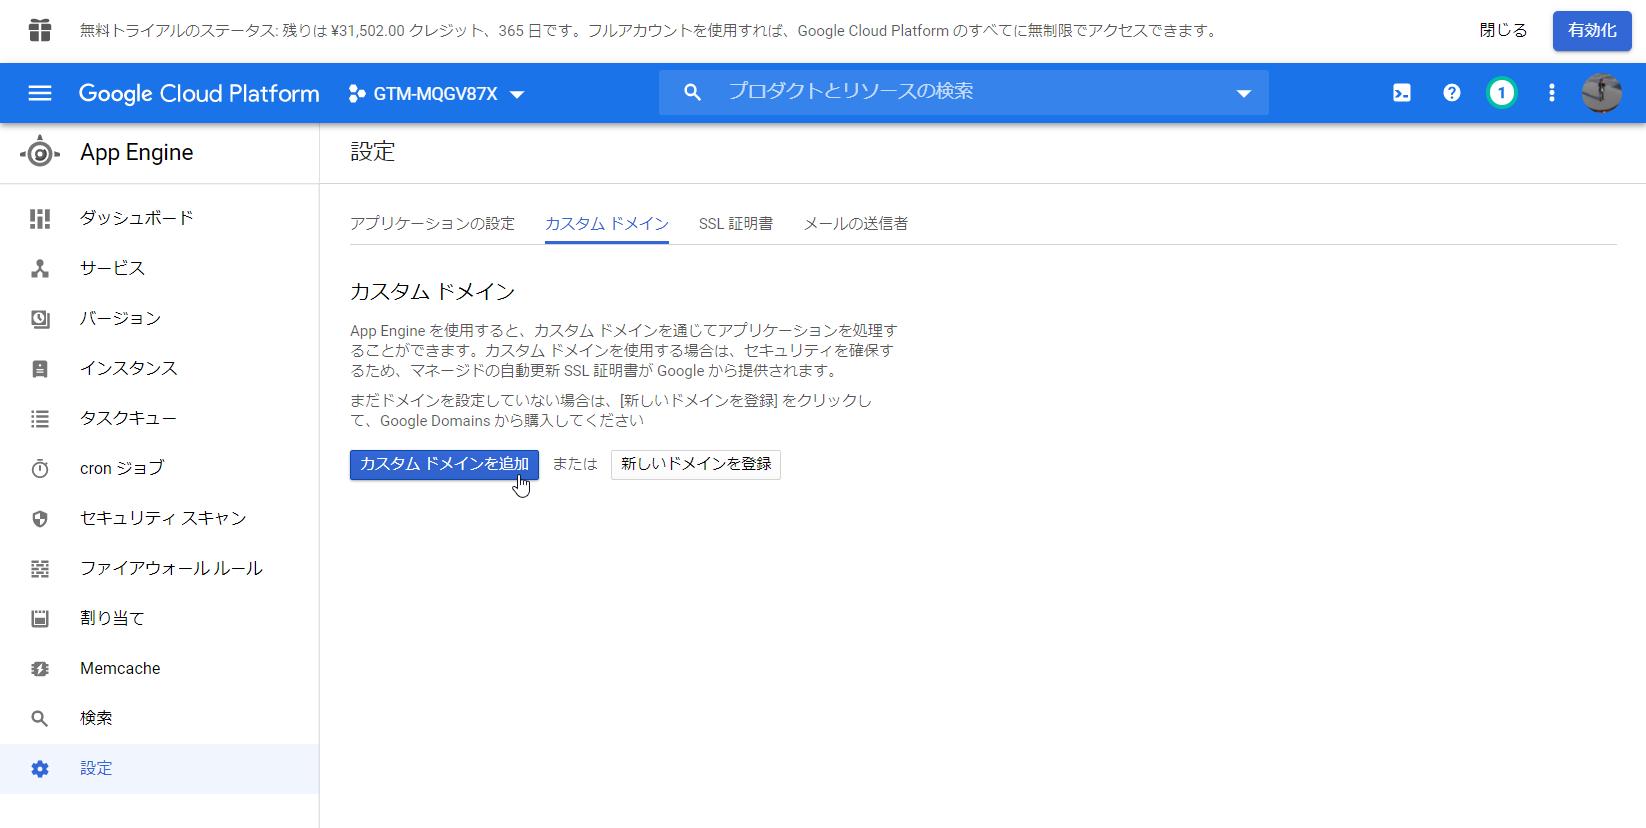 Google Cloud Plartformでカスタムドメイン設定をするための画面